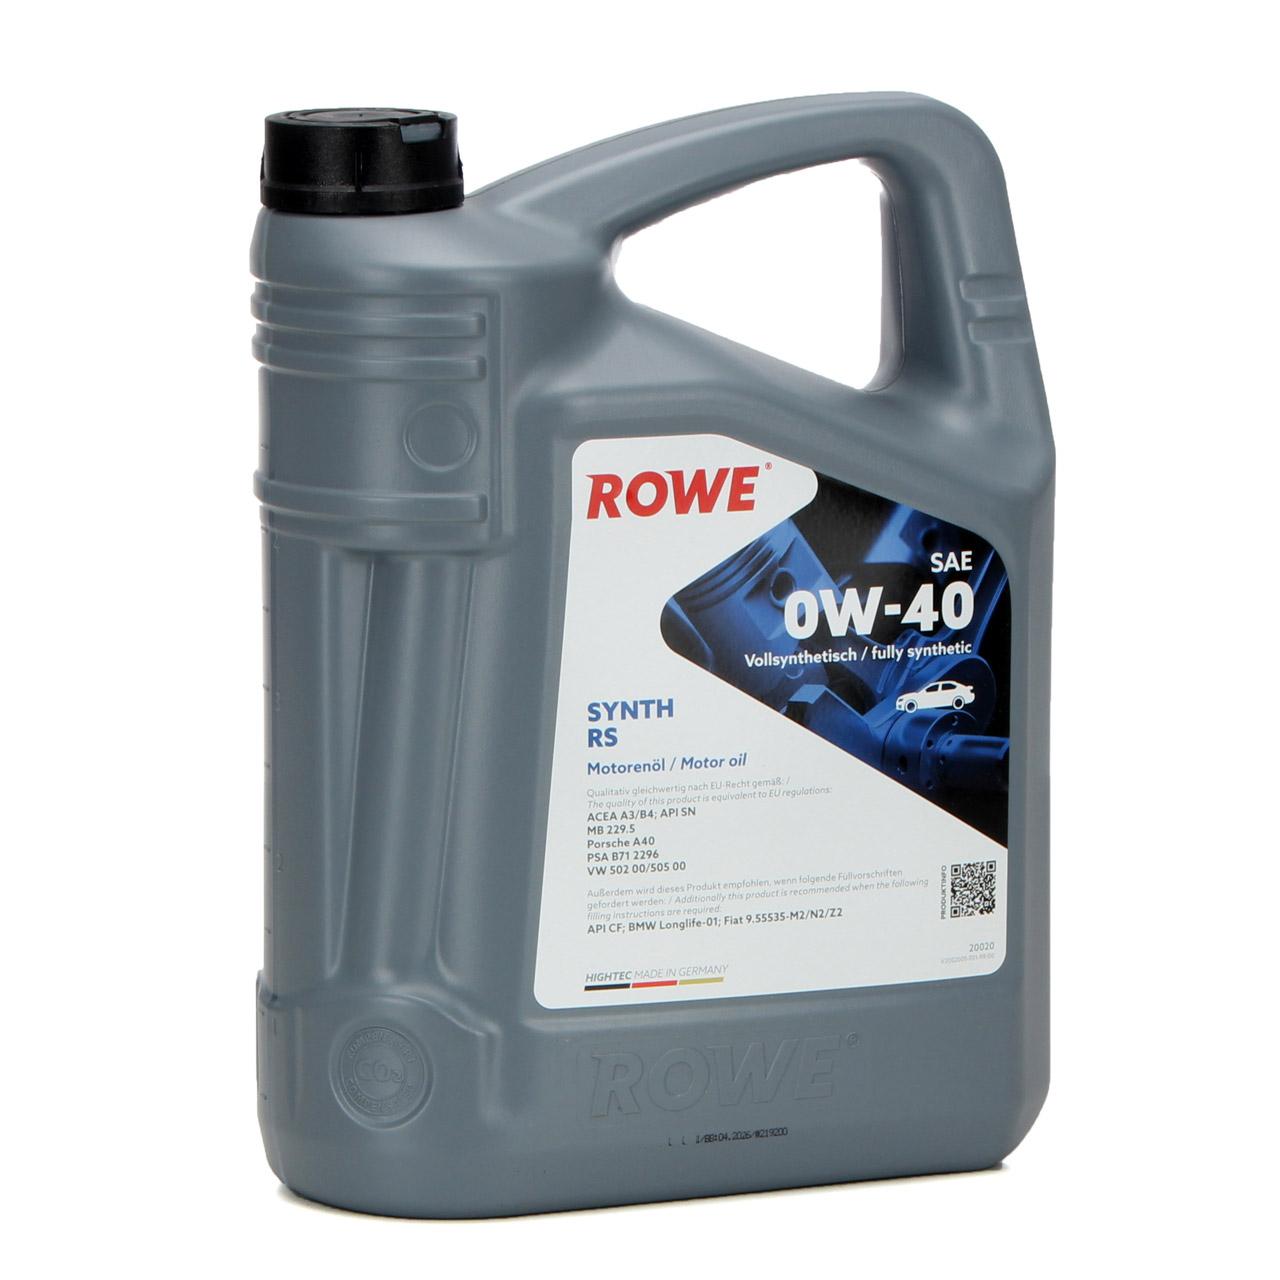 5L 5 Liter ROWE Motoröl Öl SYNTH RS 0W-40 MB 229.5 PSA B71 2296 VW 502.00/505.00